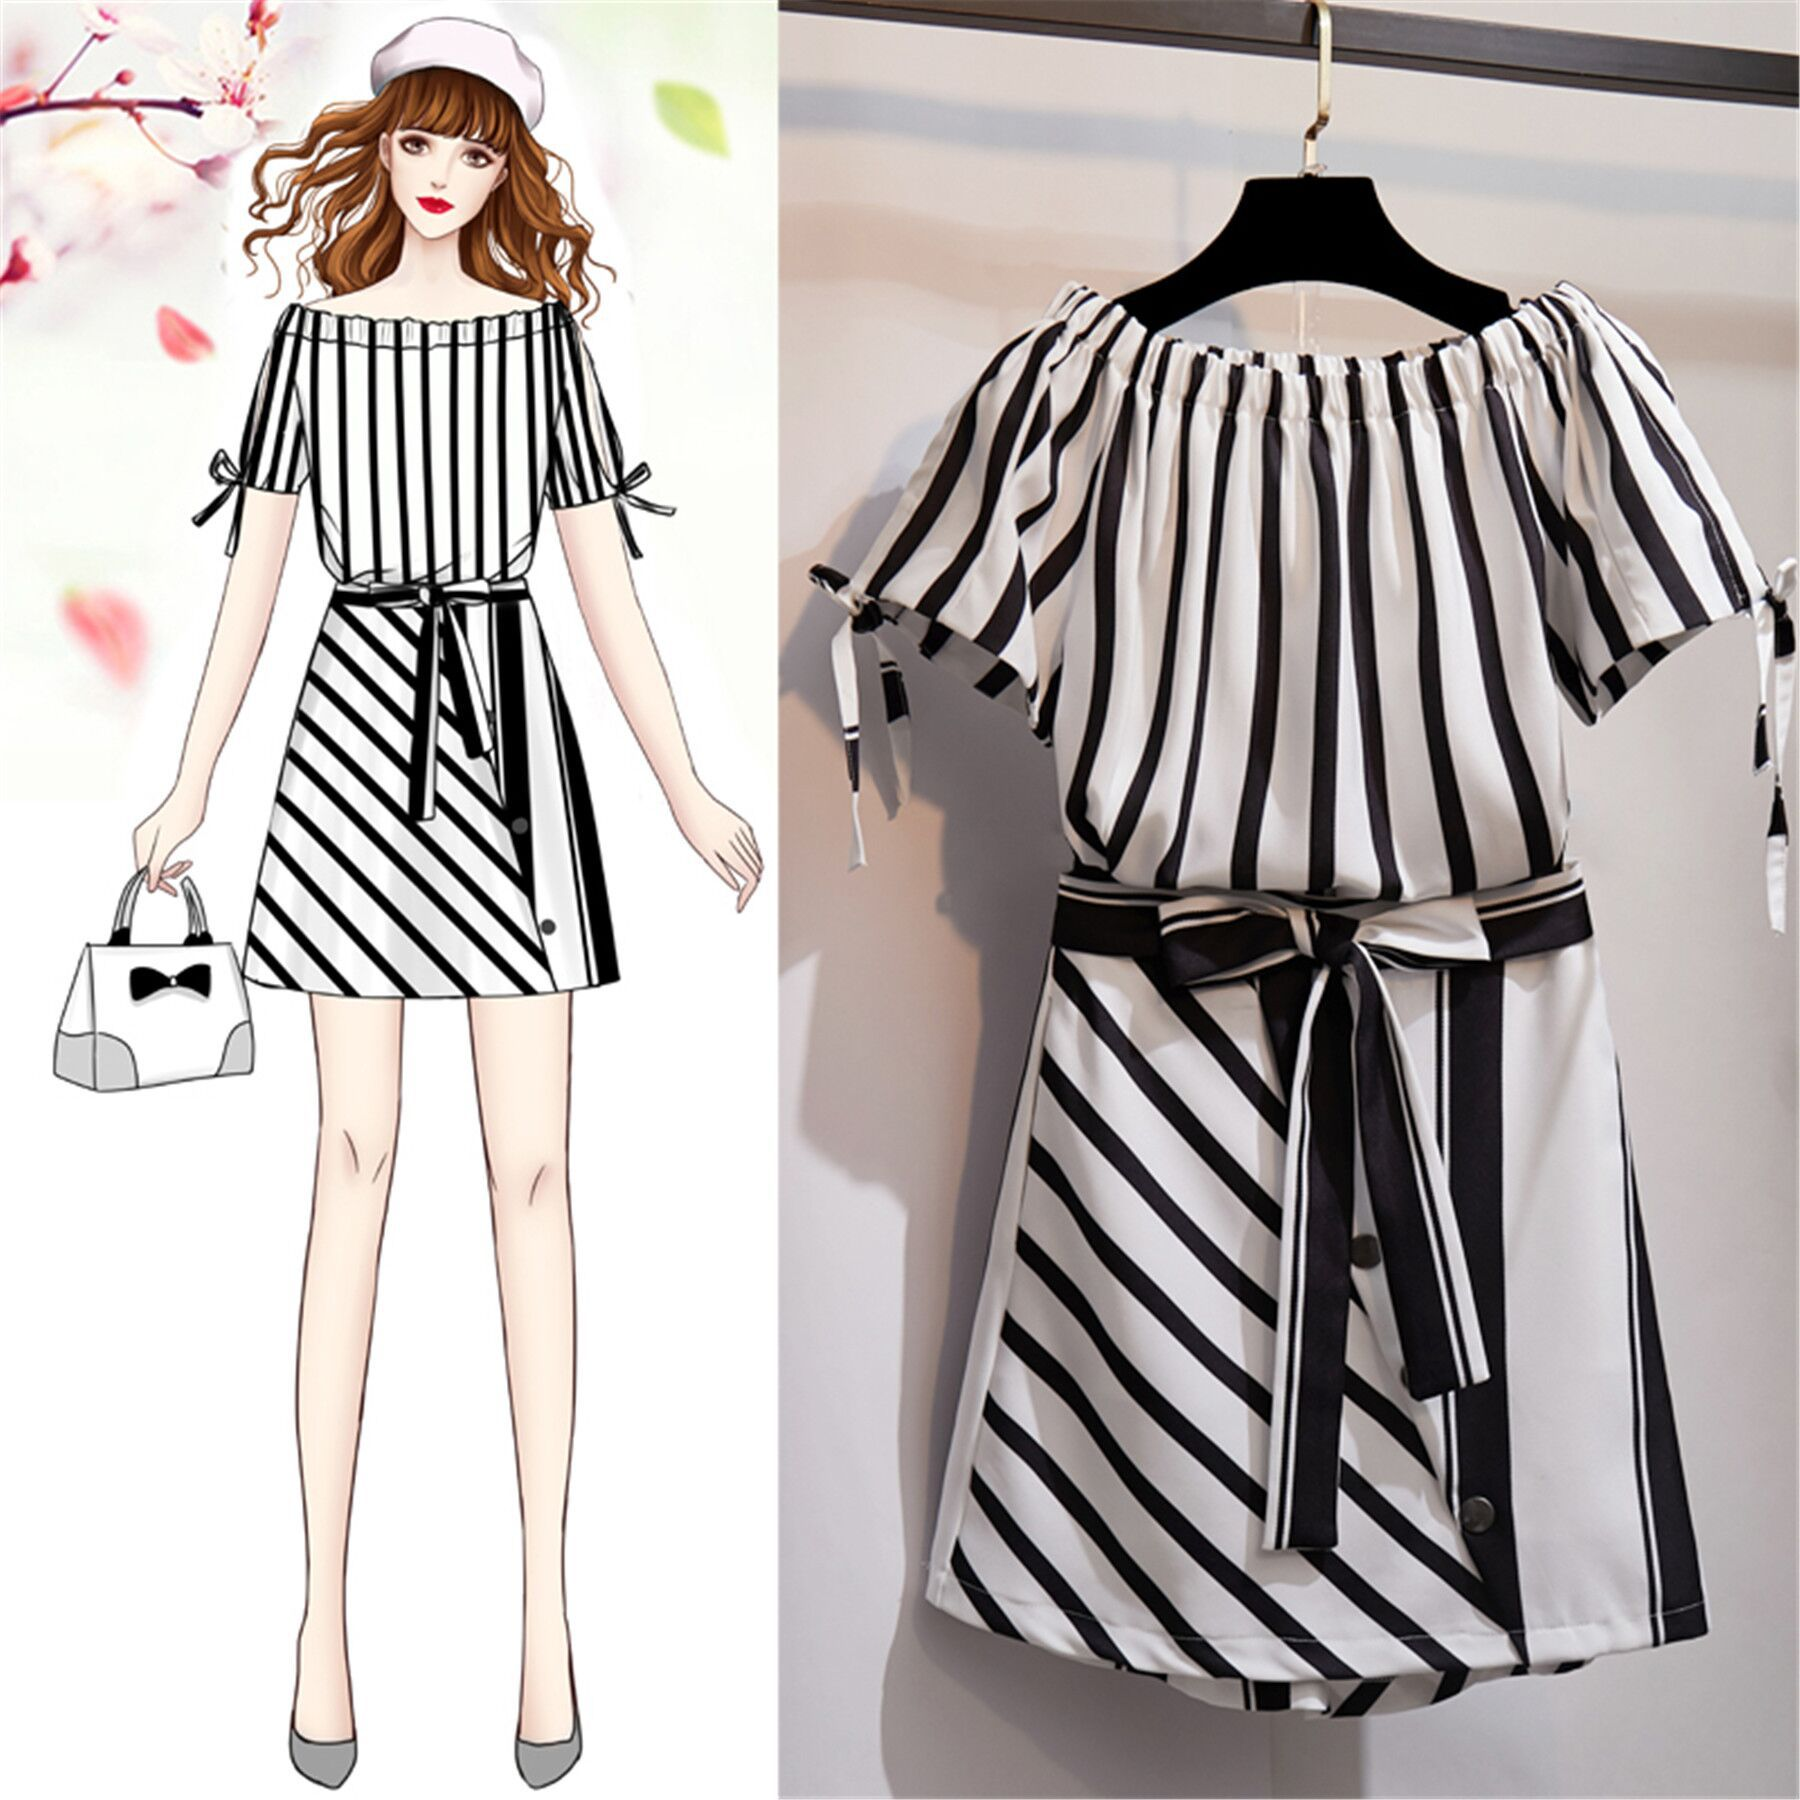 Large Size Dress New Style Dress Western Style Large GIRL'S Summer Wear Two-Piece Set Fashionable Online Celebrity Set